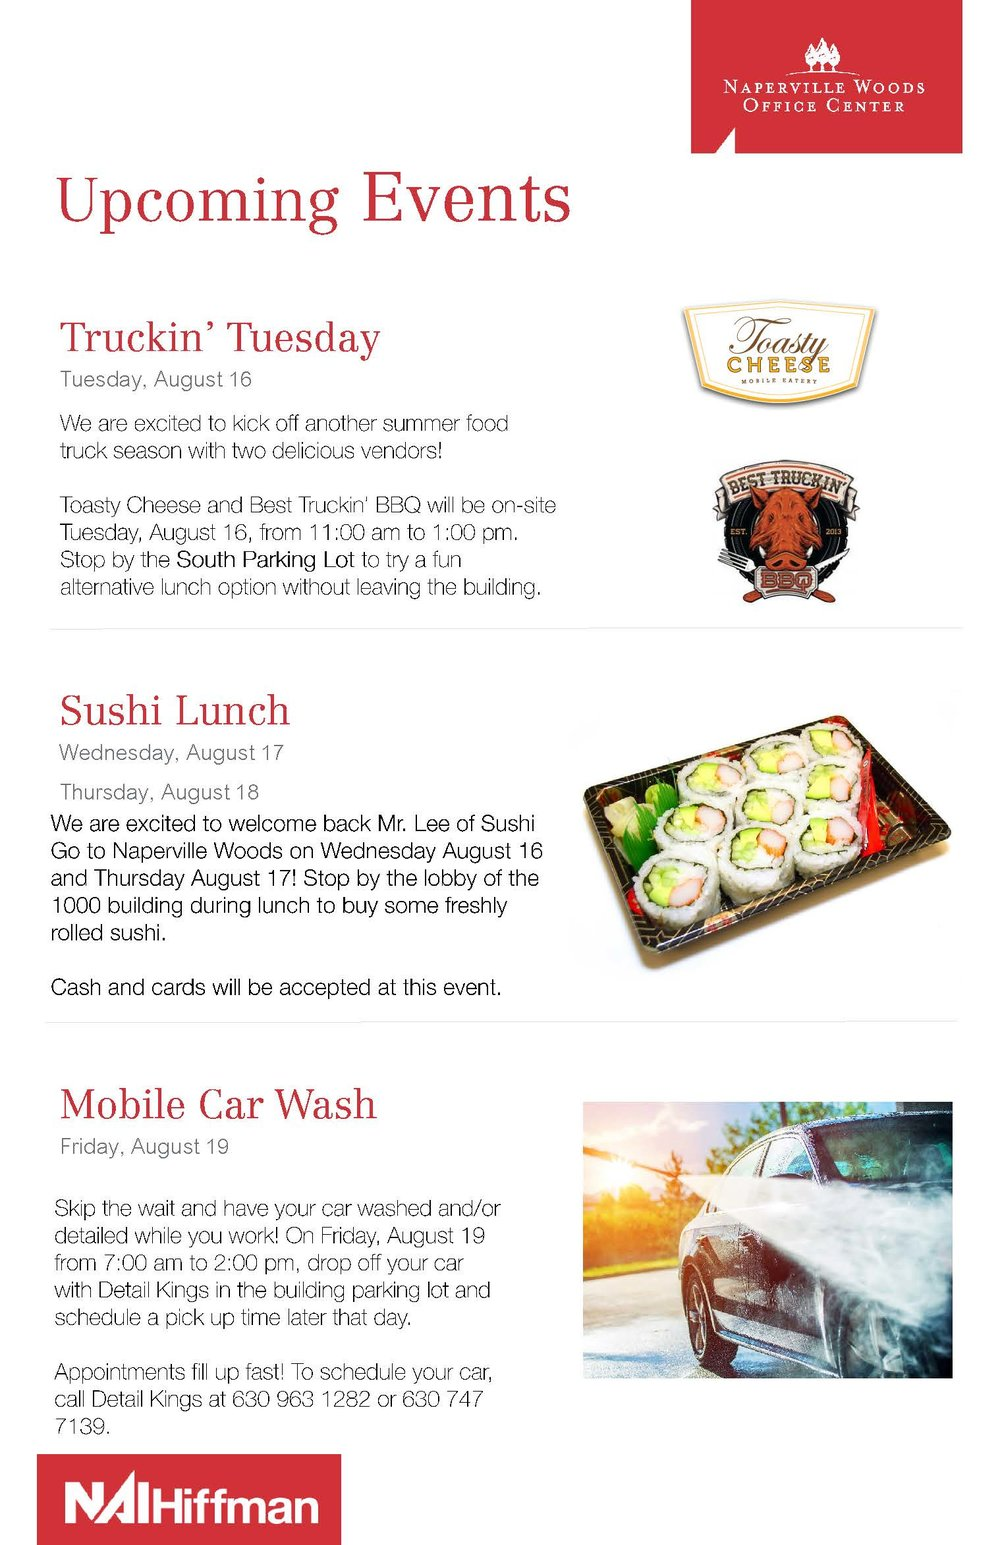 Naperville Woods - Food Trucks Sushi Detail Kings.jpg